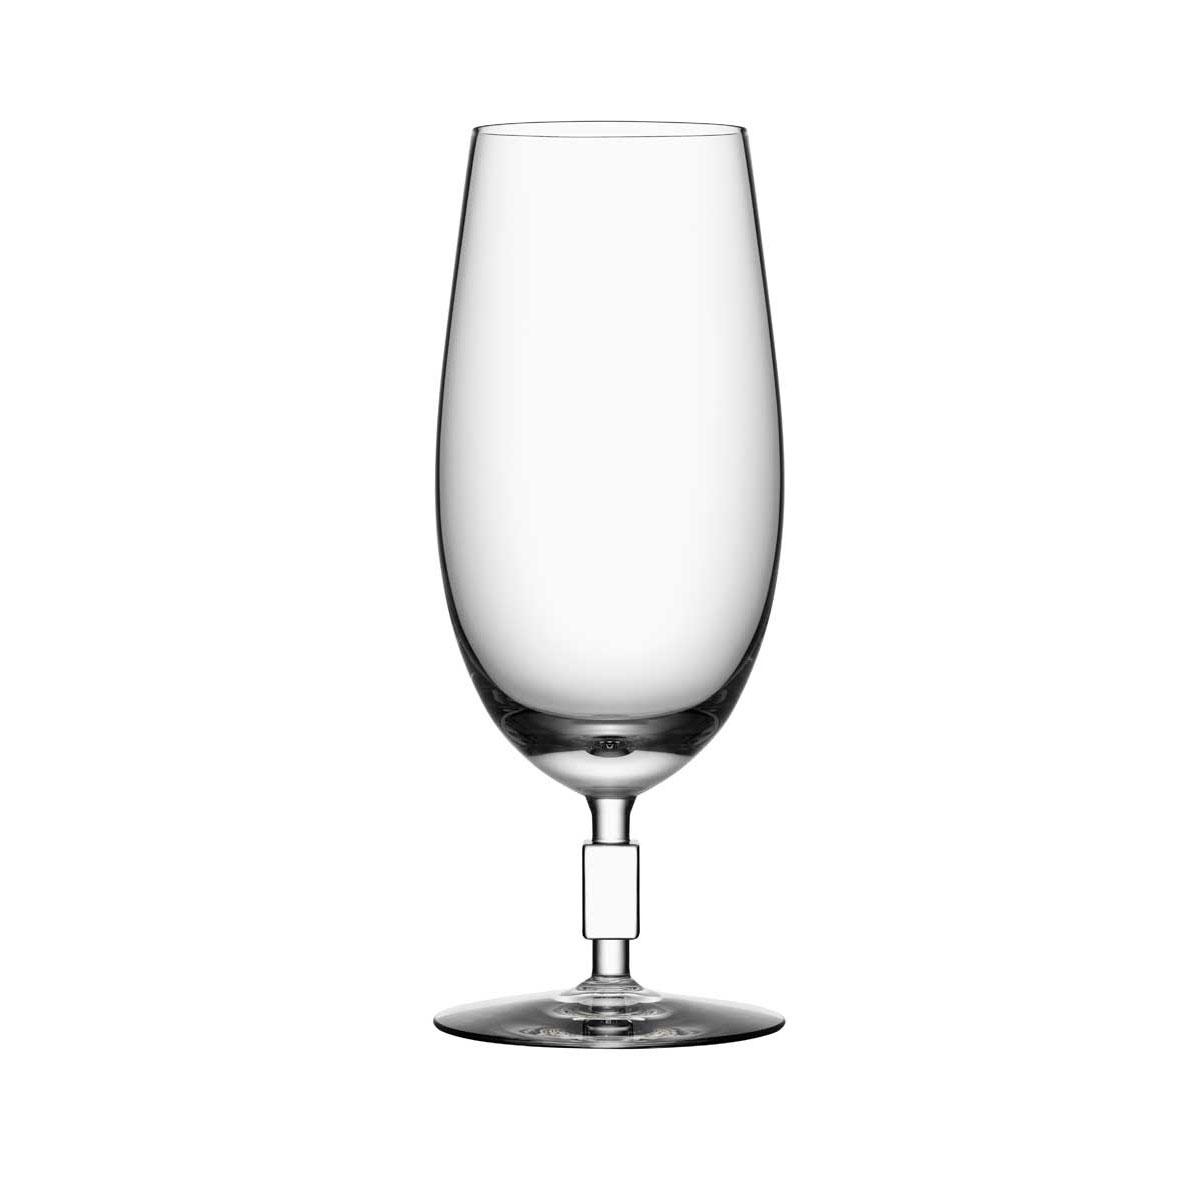 Orrefors Crystal, Unique Crystal Beer, Single